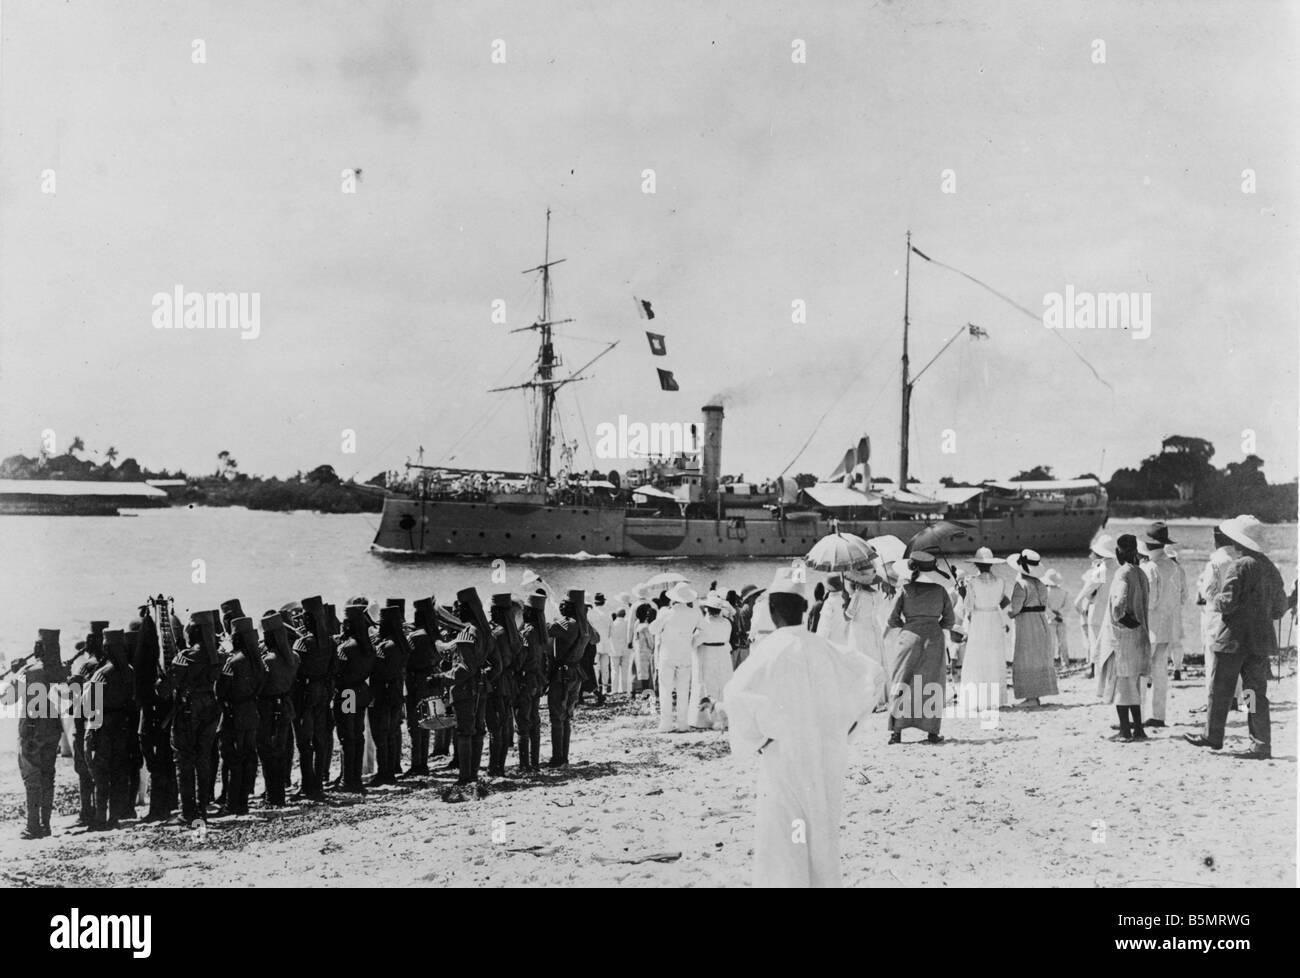 9AF 1914 0 0 A8 1 E S M S Seeadler Photo Dar es Salaam Tanzanie aujourd'hui Africa Orientale allemande comme Photo Stock